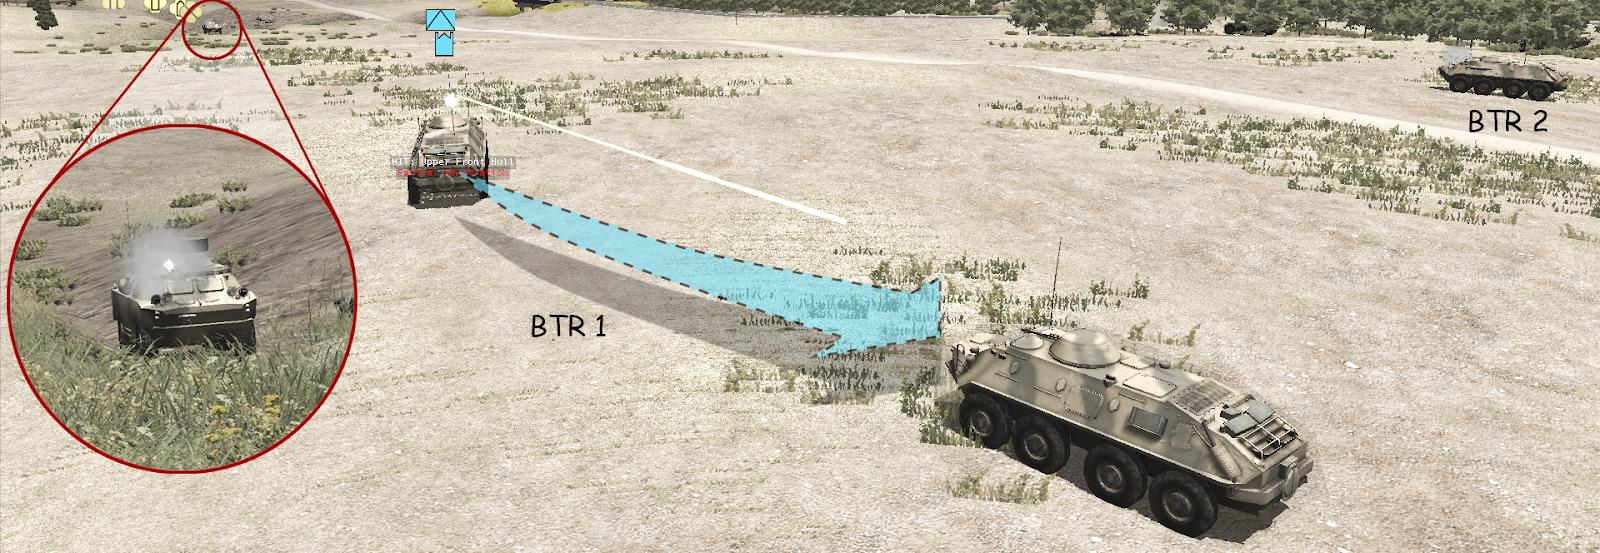 D+BTR-1-Action+1B.png